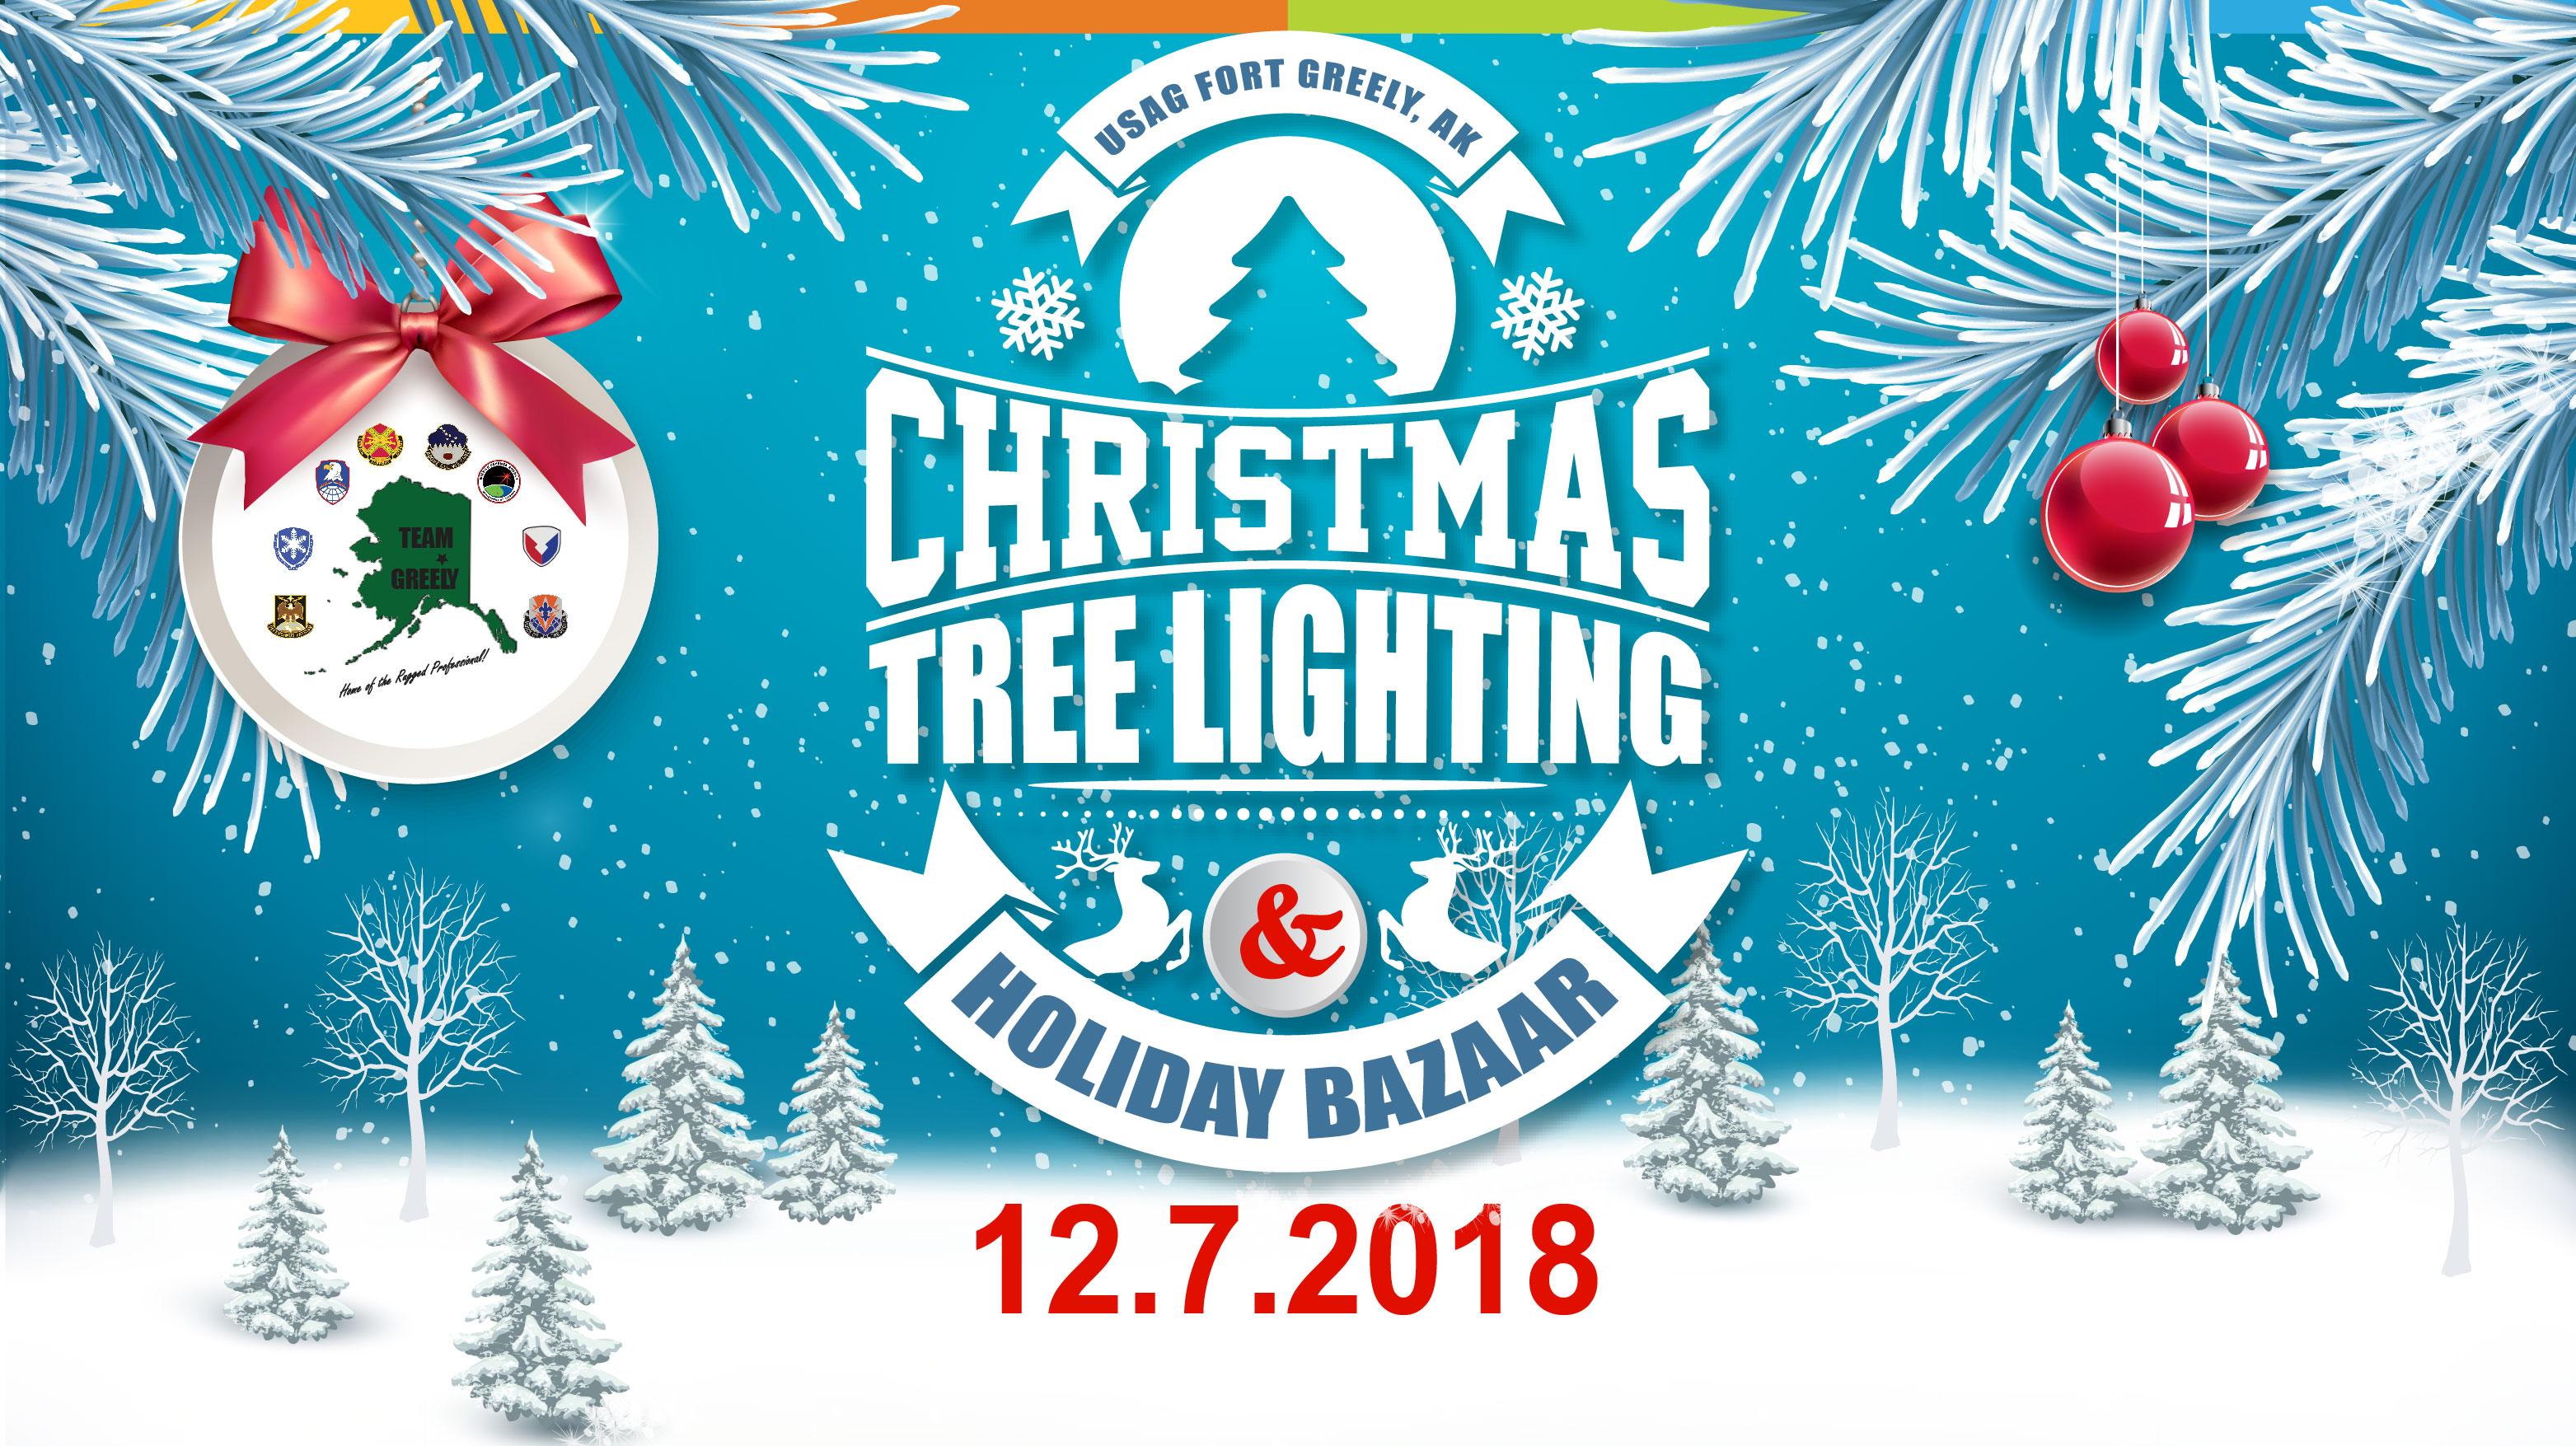 Christmas Tree Lighting Ceremony & Holiday Bazaar